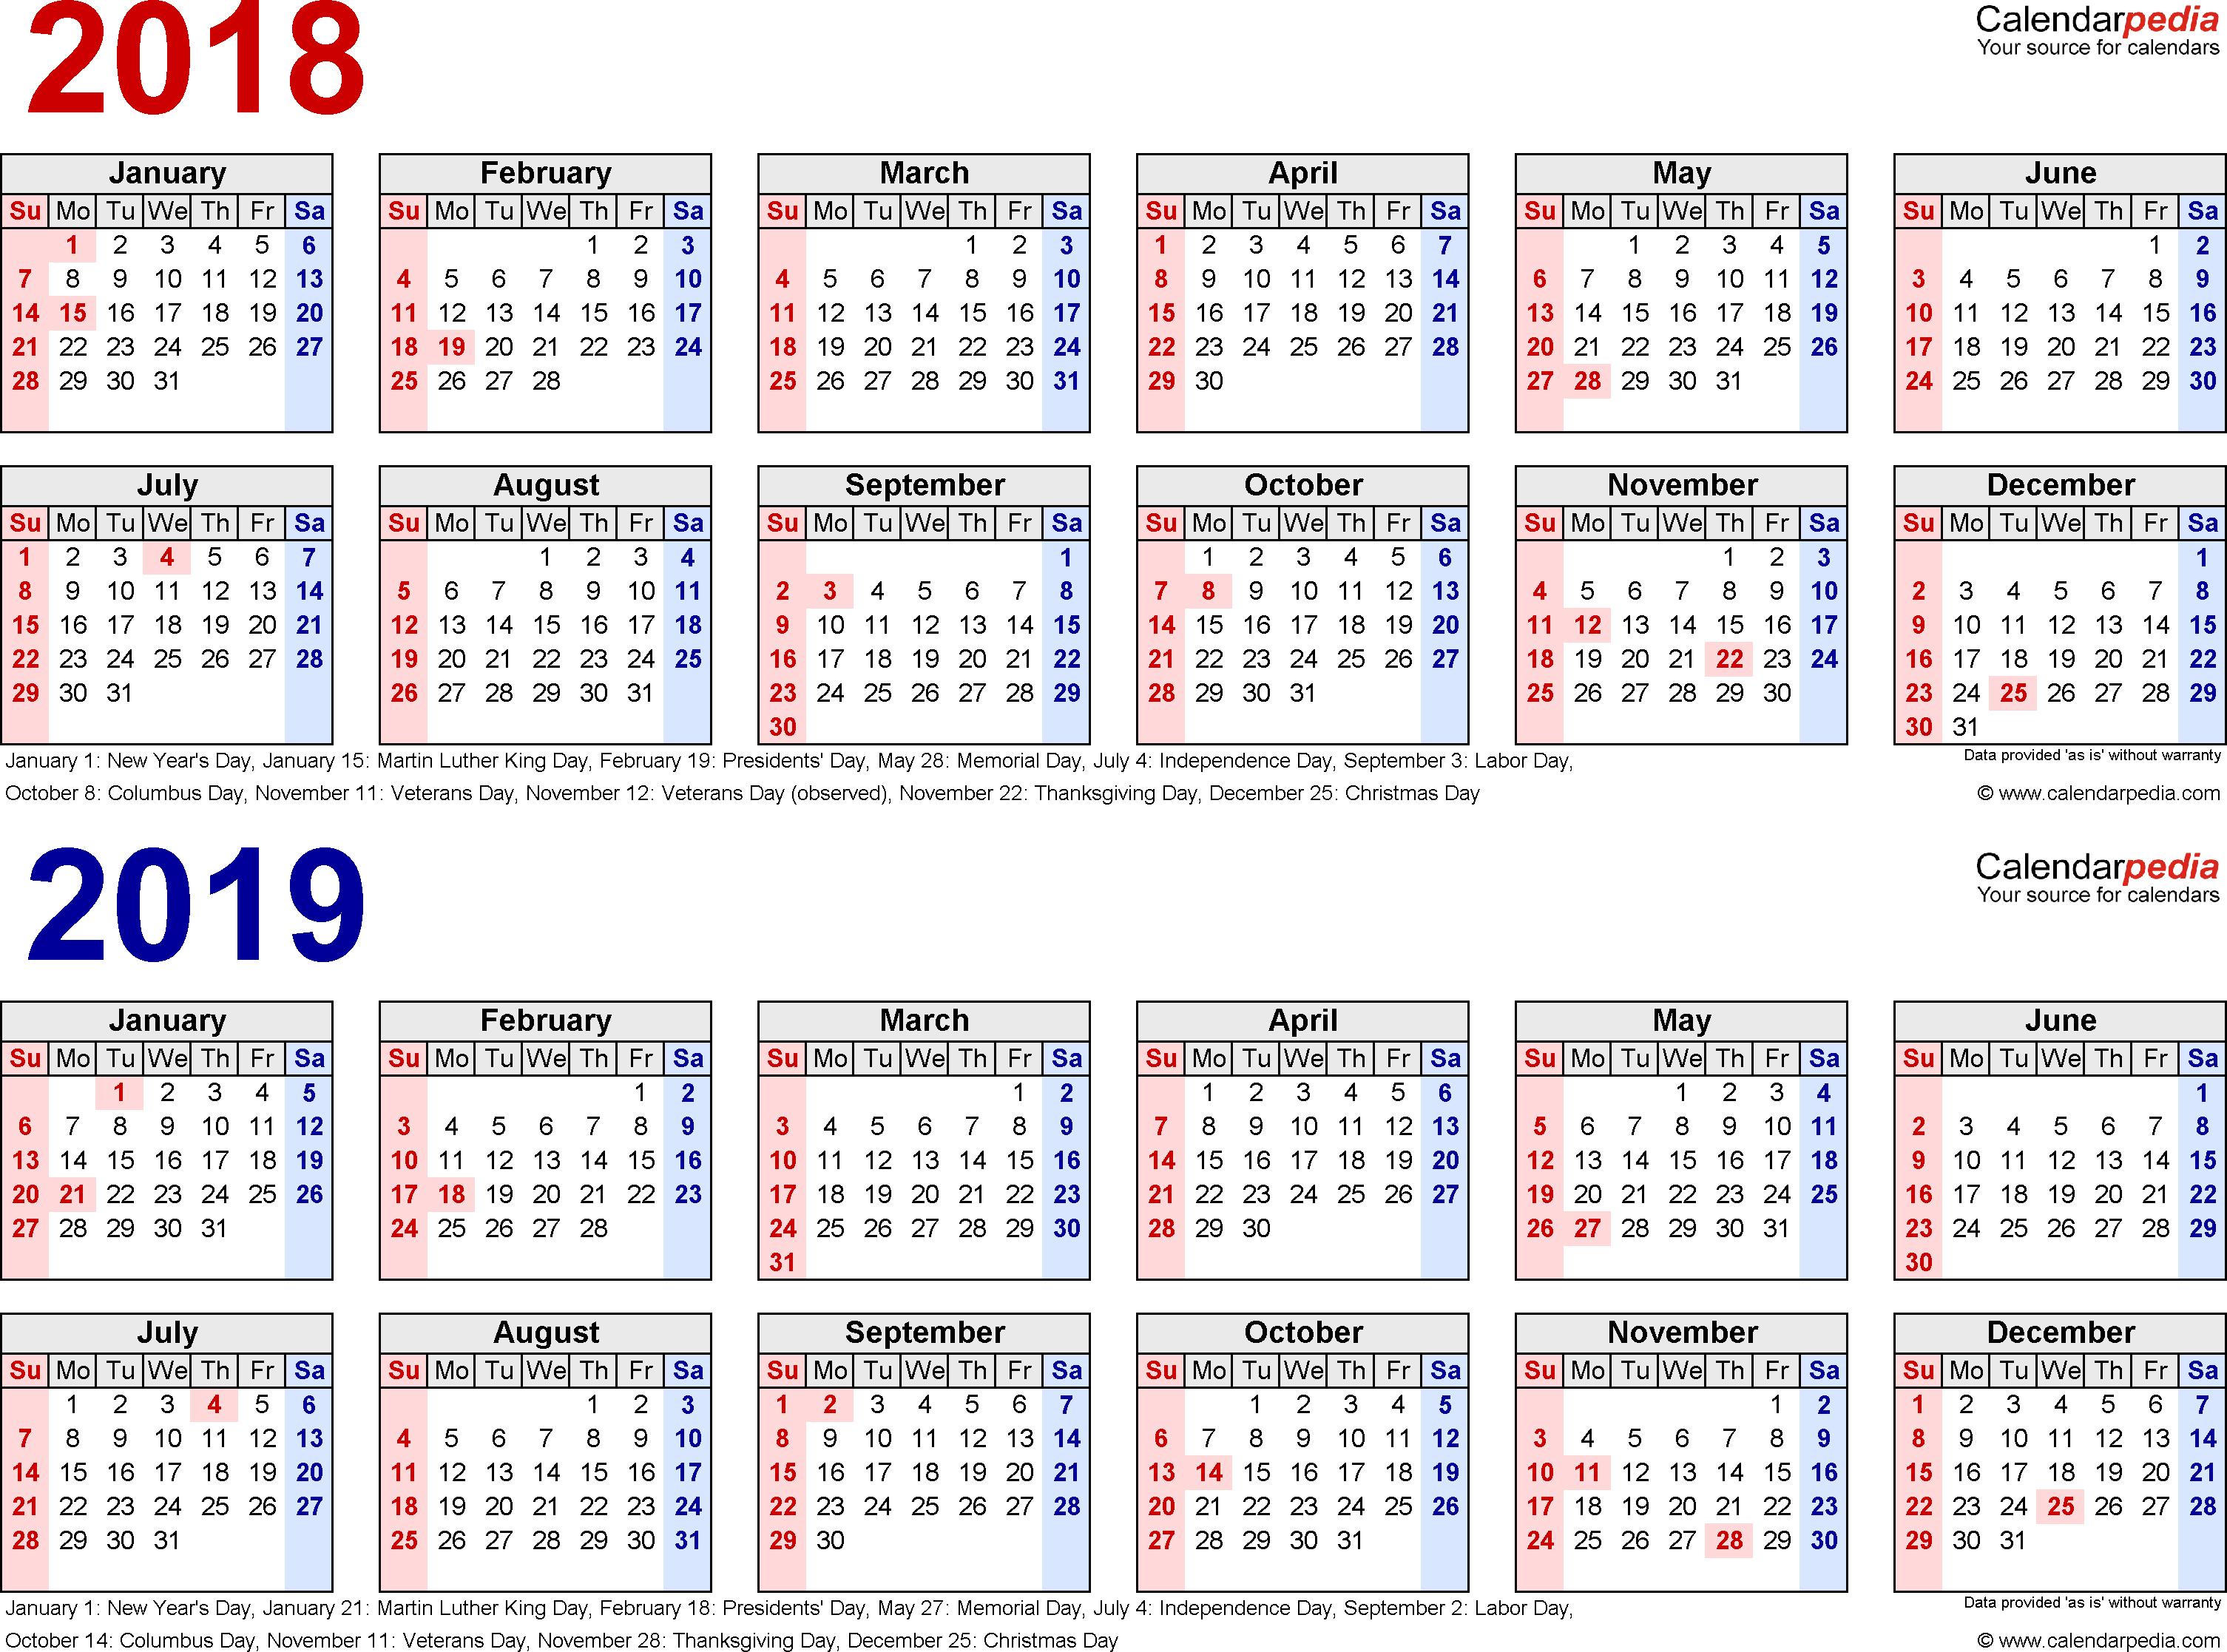 2018-2019 Calendar - Free Printable Two-Year Excel Calendars for Vetex 2020 Word Calendar Download